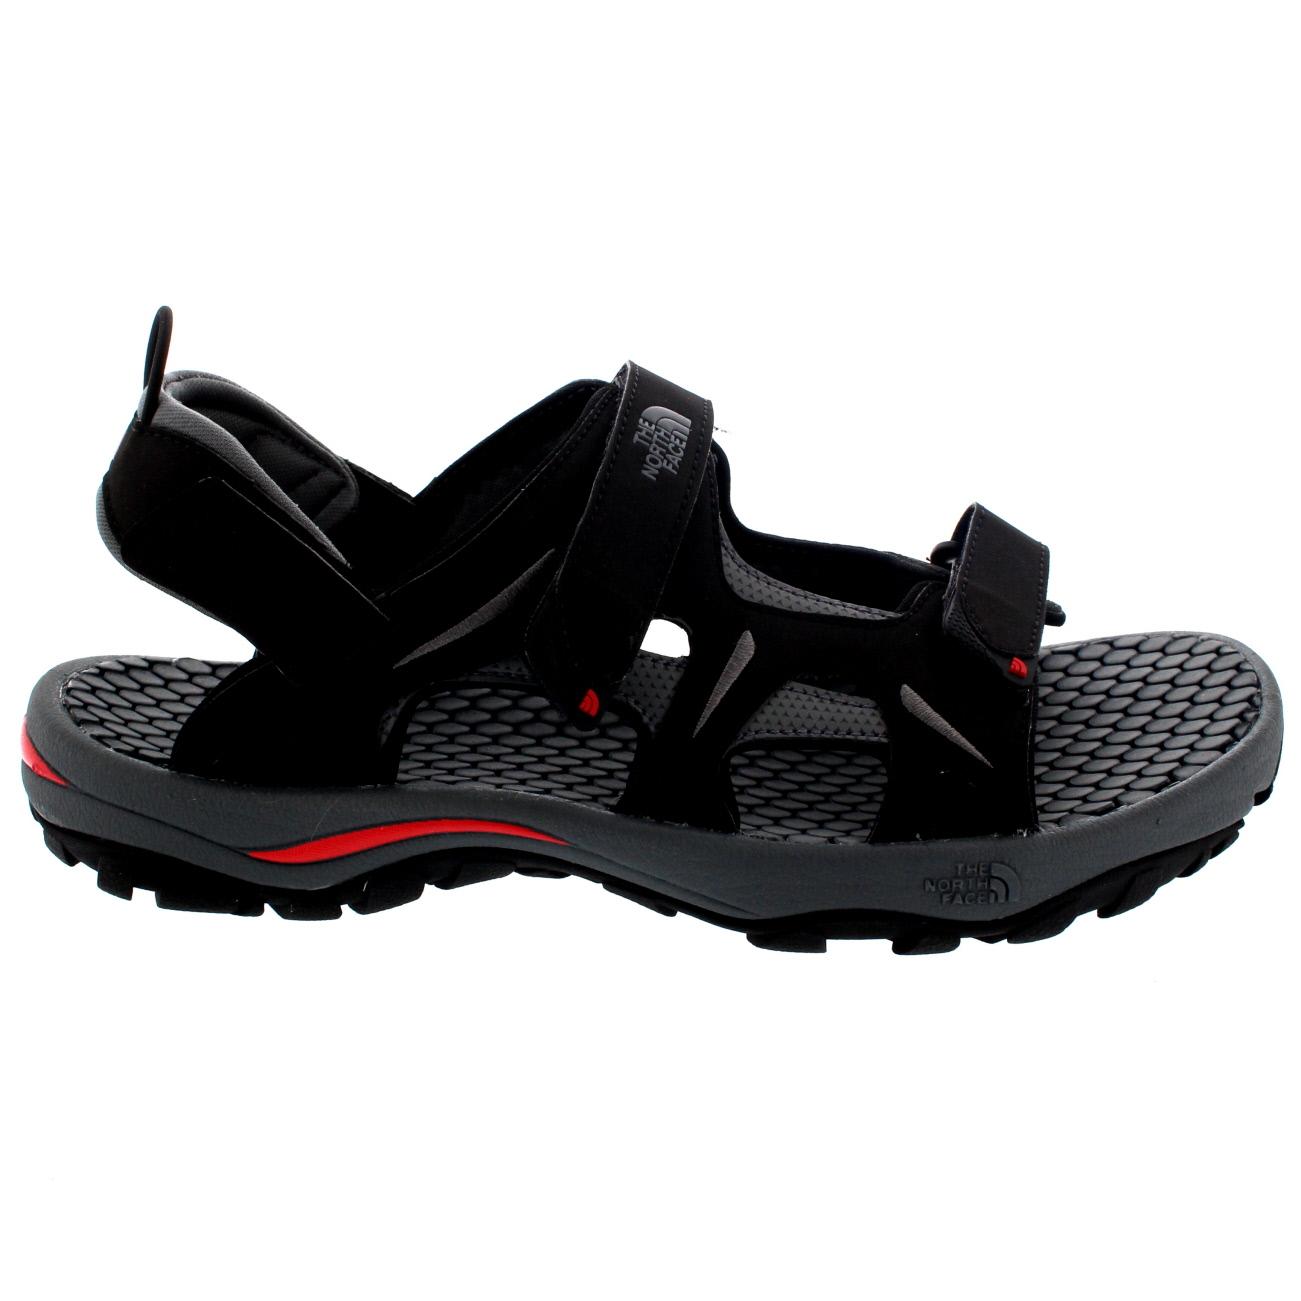 De Zapatos The Hombre Shdxcrqbt Senderismo Hedgehog Sandalia Para North 3lJcuKTF1